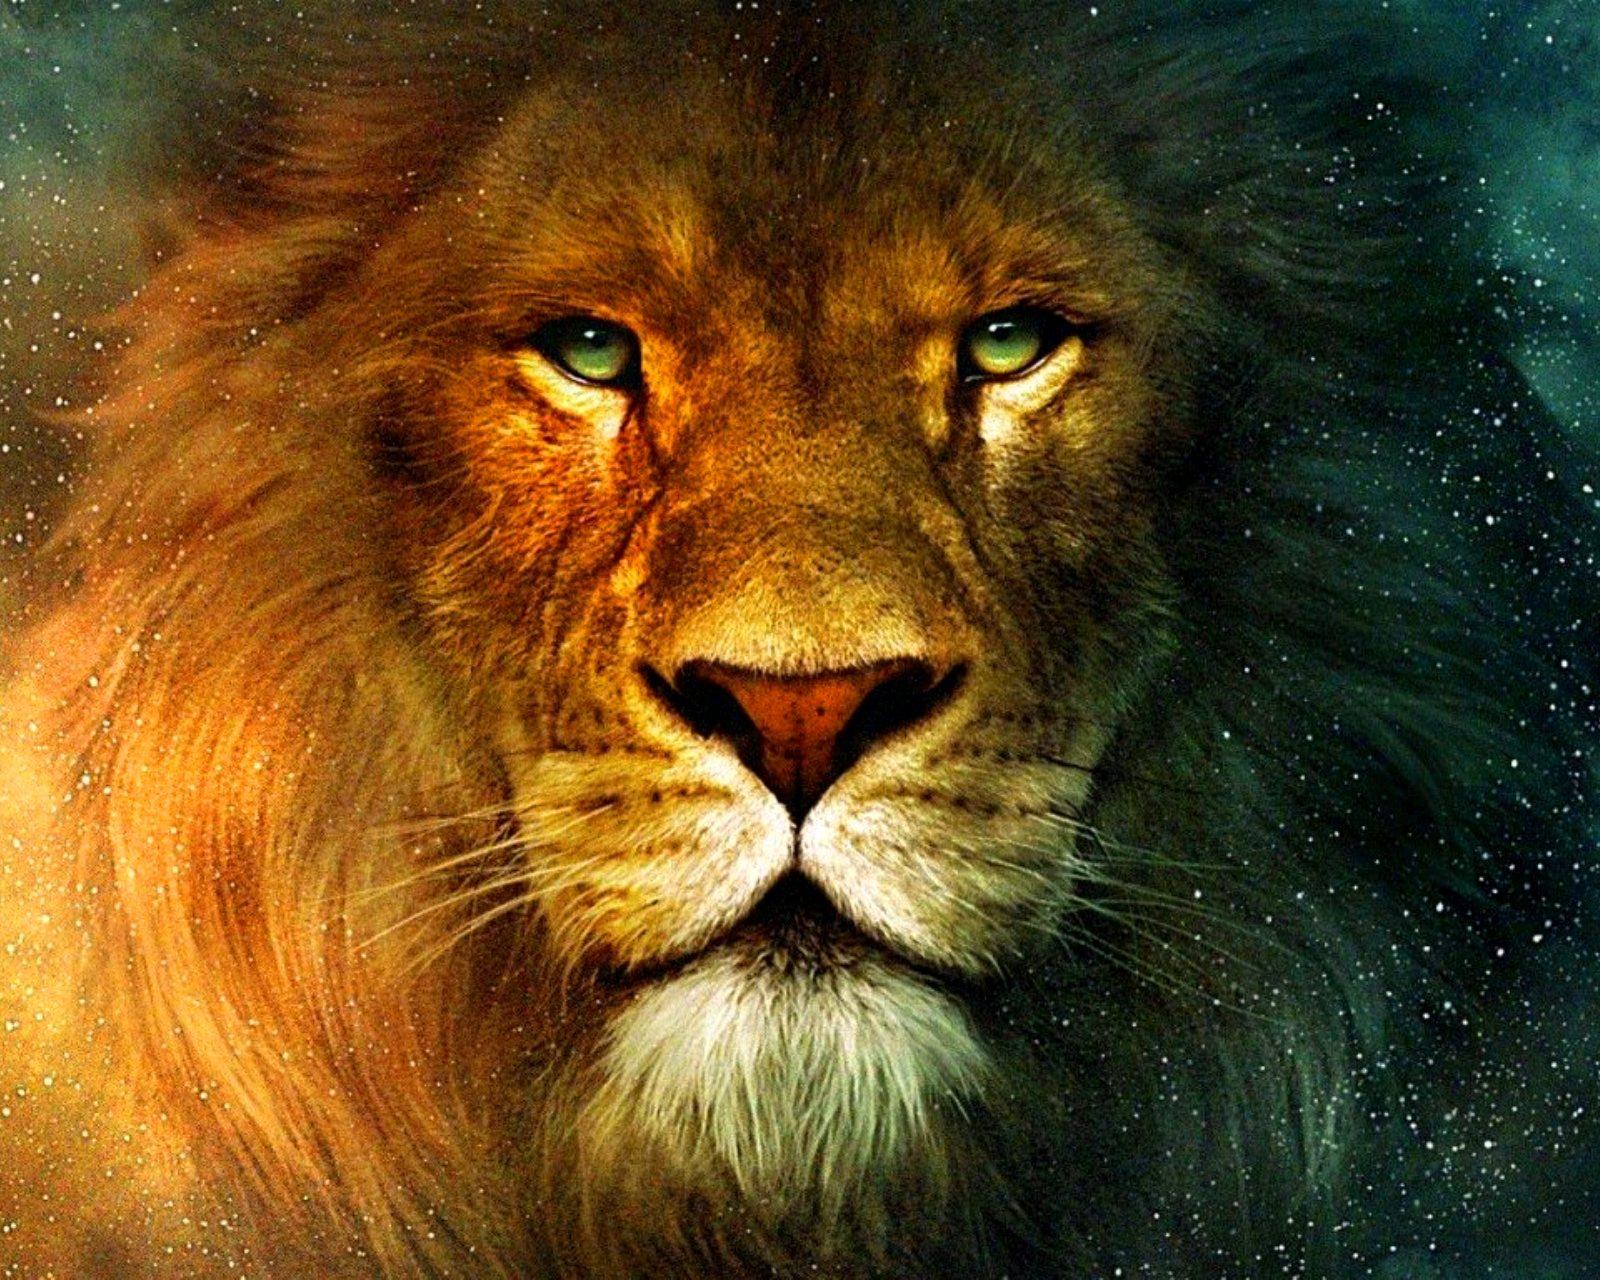 Tags Aslan Lion 1600x1280 wallpaper1600X1280 wallpaper screensaver 1600x1280